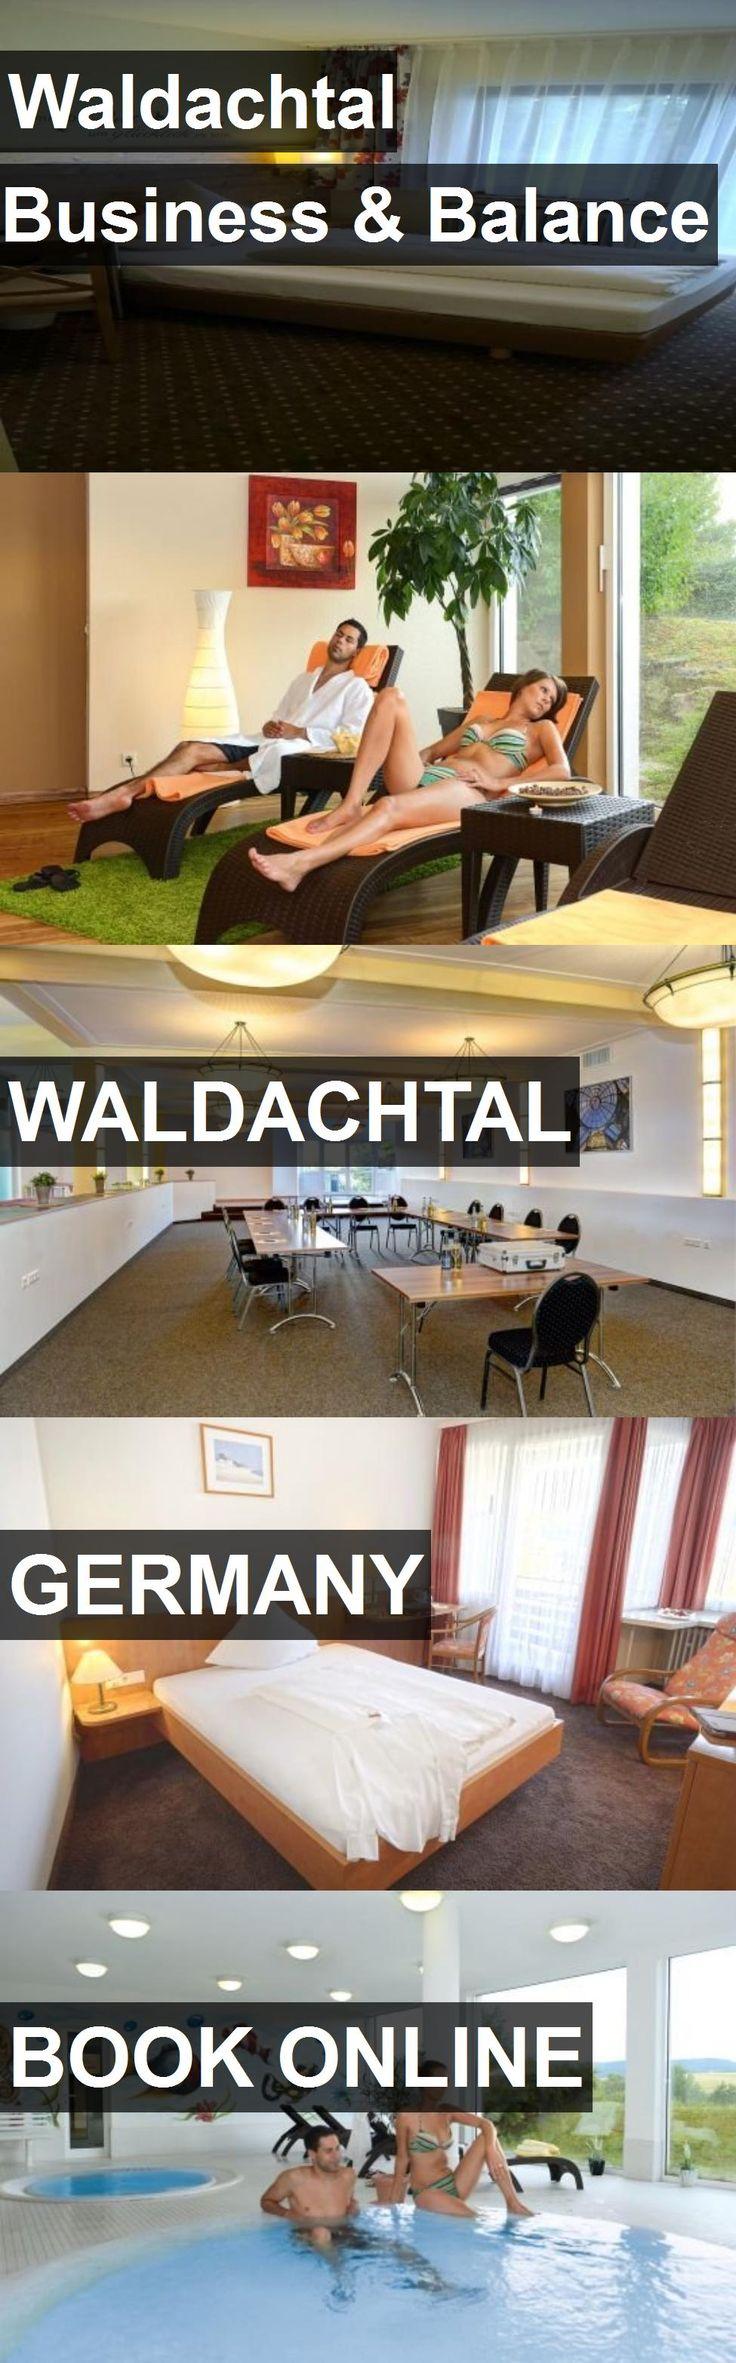 Hotel Waldachtal Business